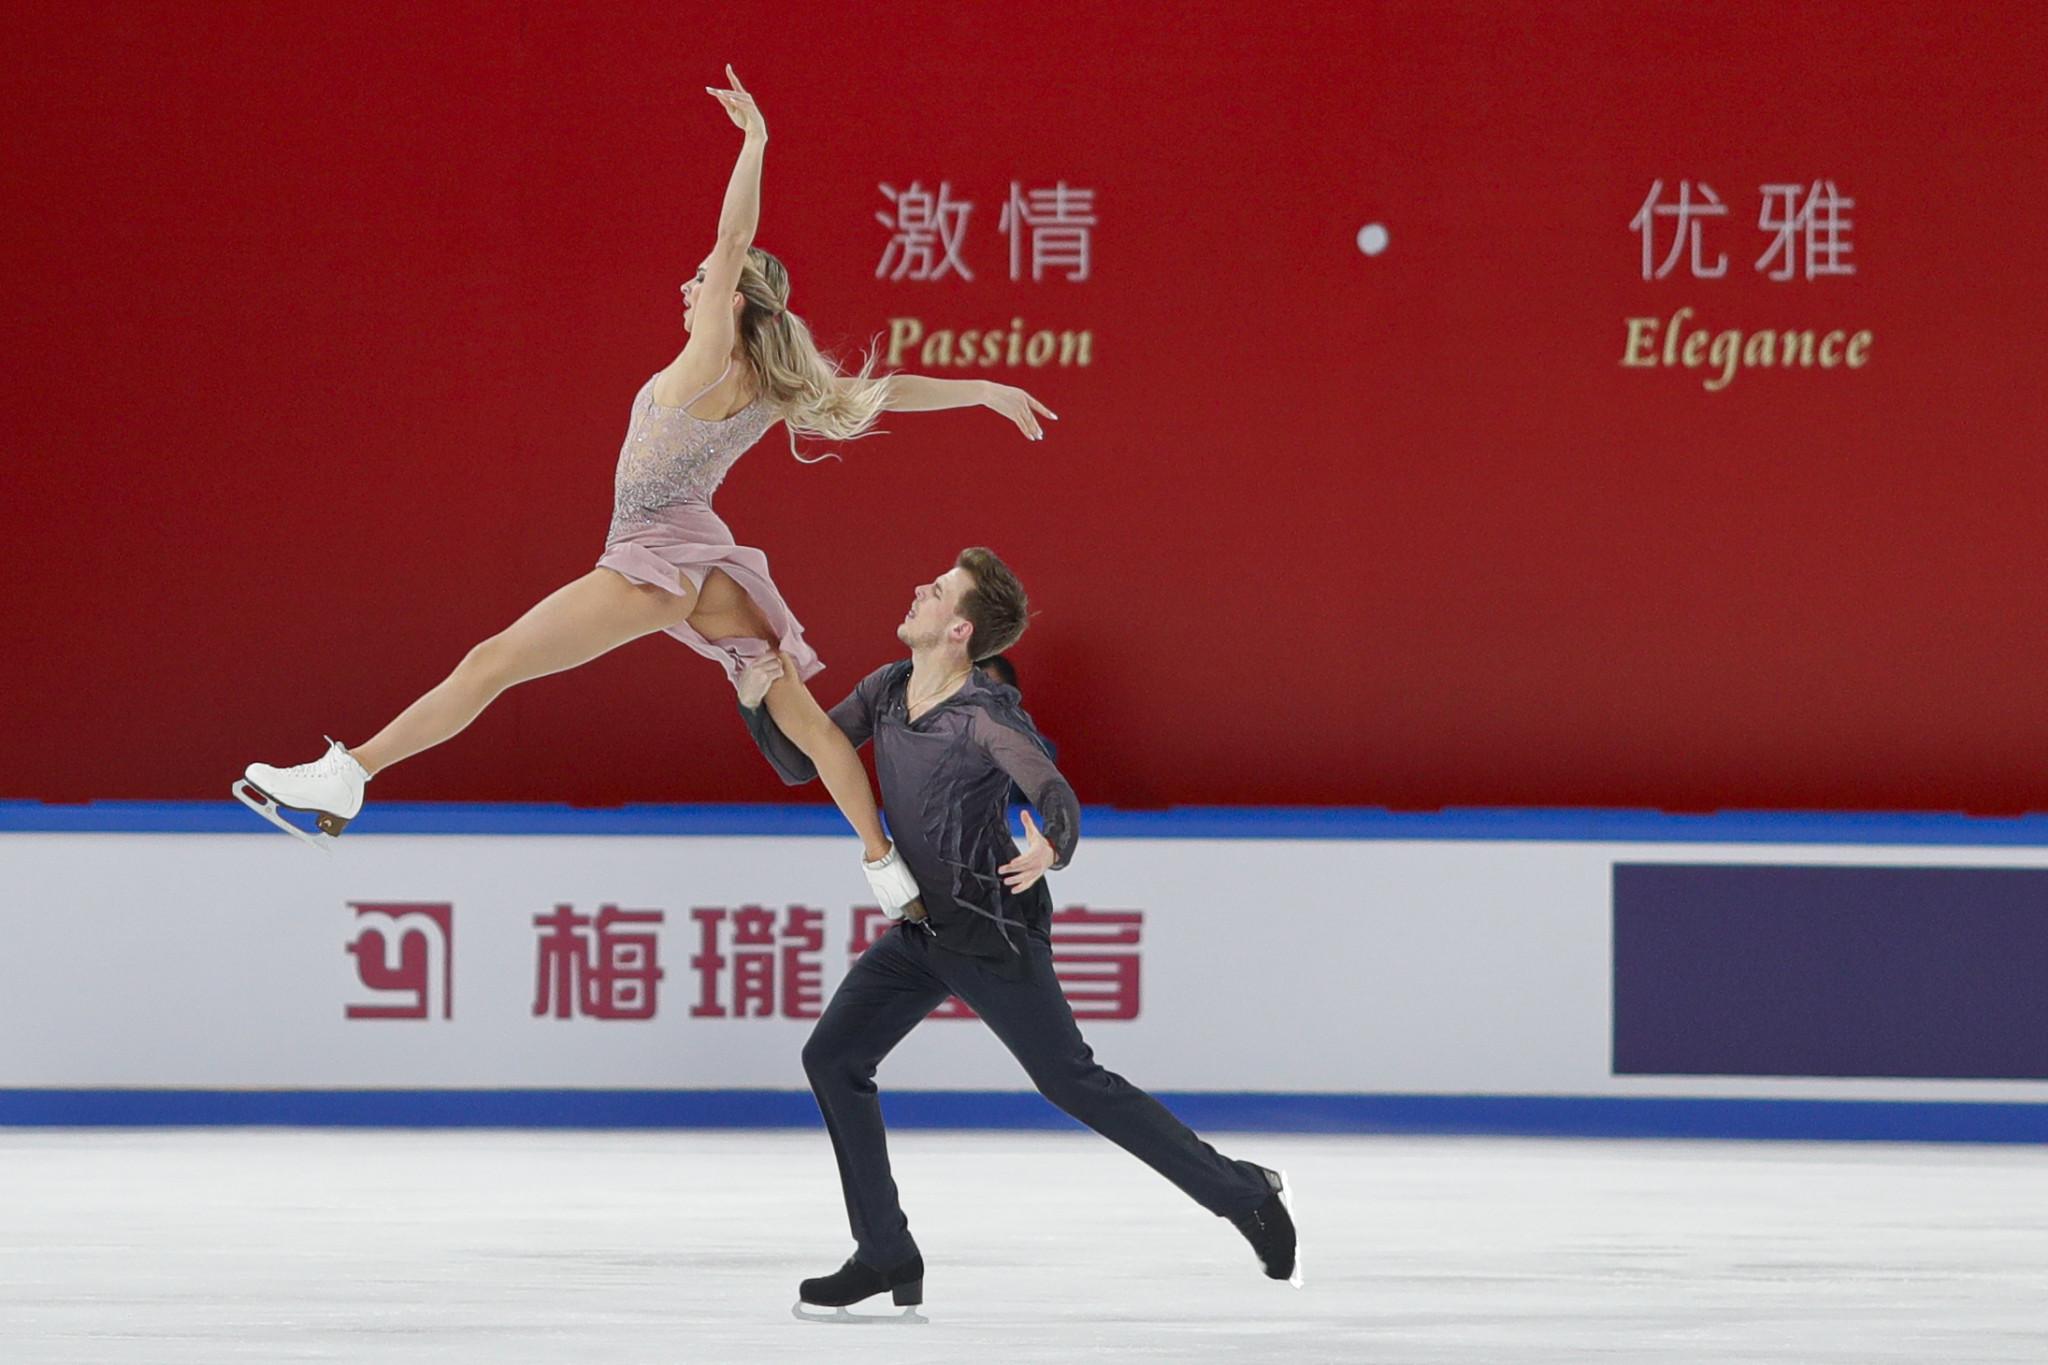 ISU Grand Prix of Figure Skating season poised to change to domestic events